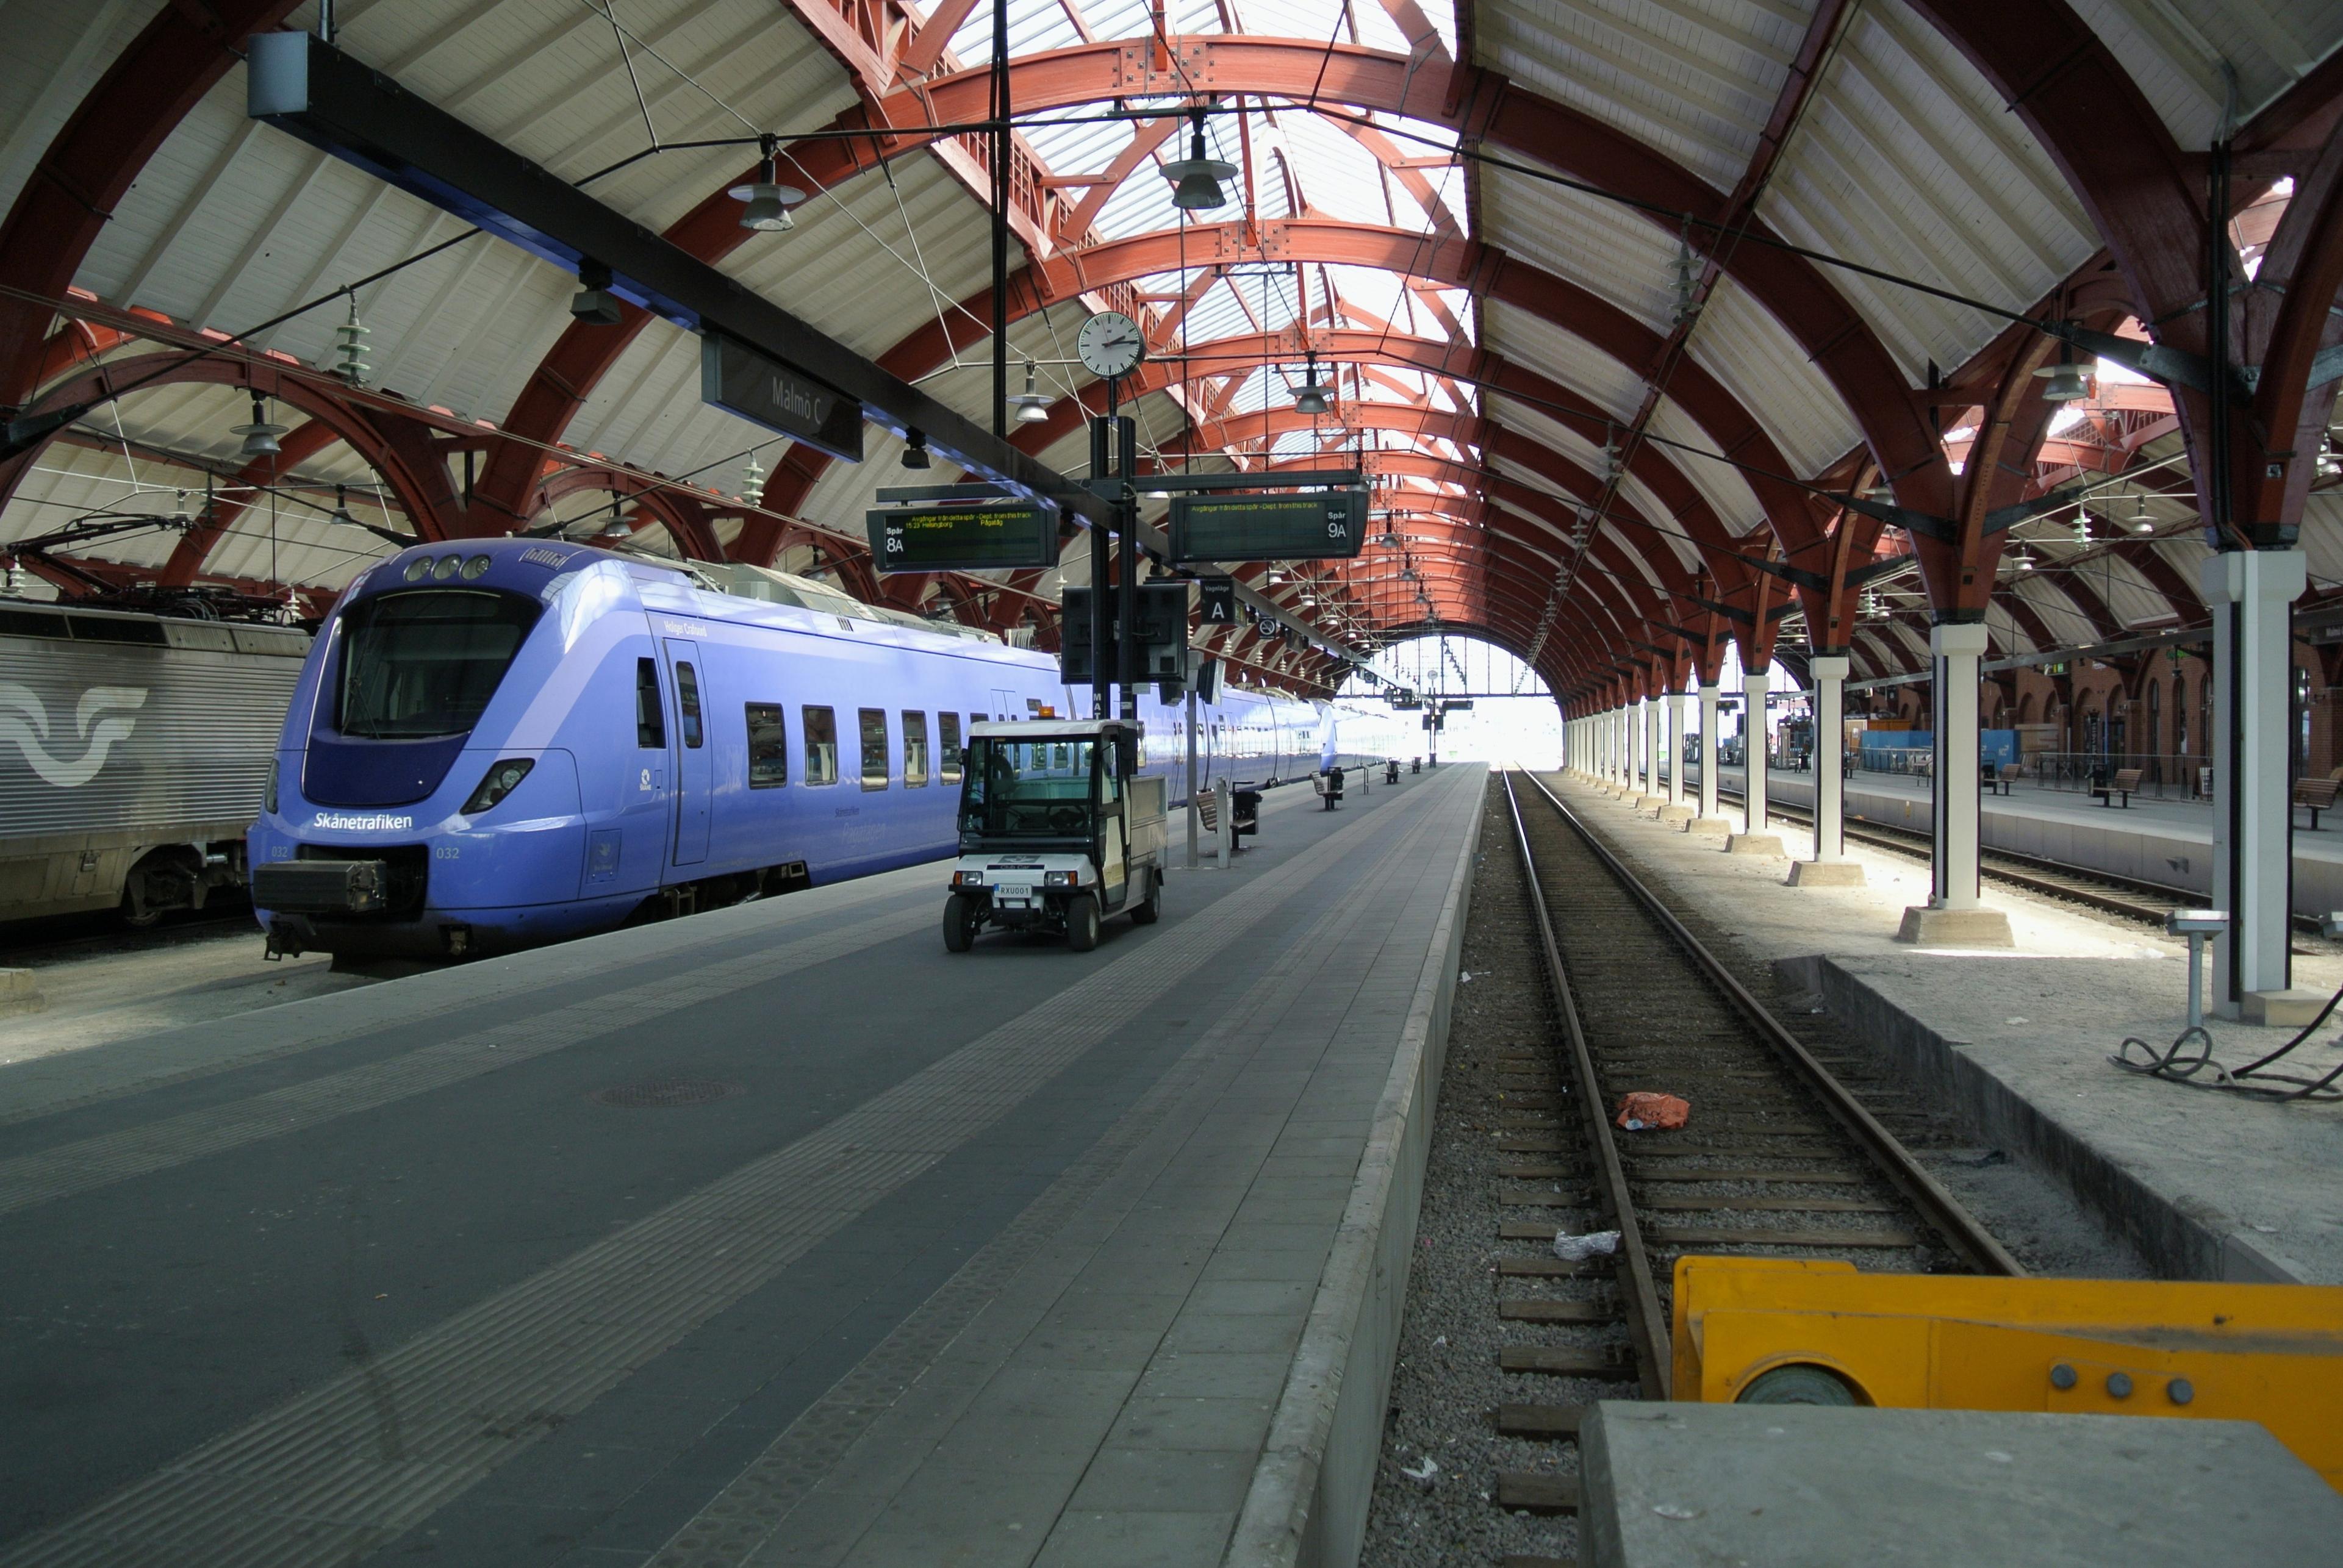 Fileskånetrafiken Train At Malmö Central Stationjpg Wikimedia